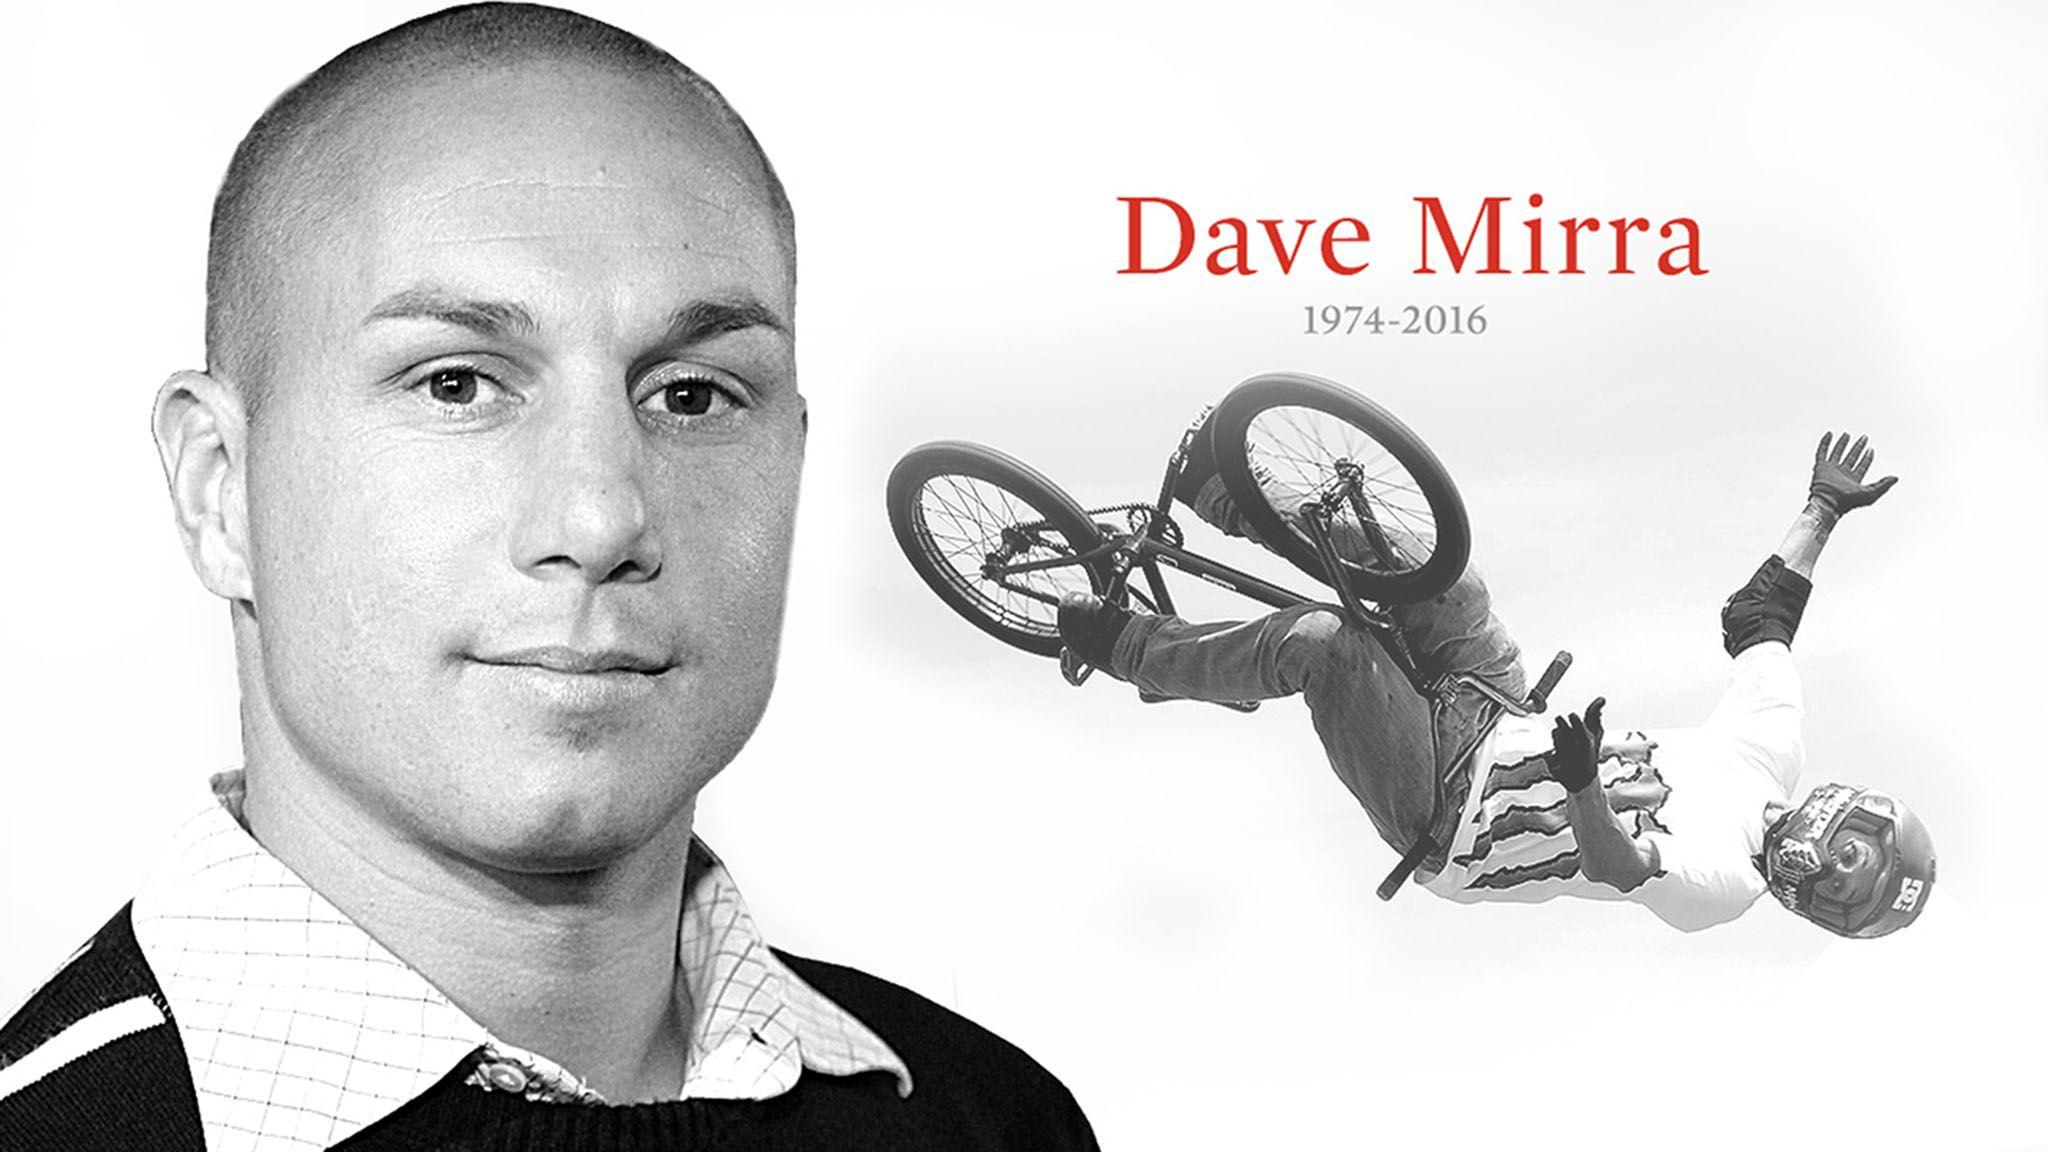 Dave Mirra, A Life